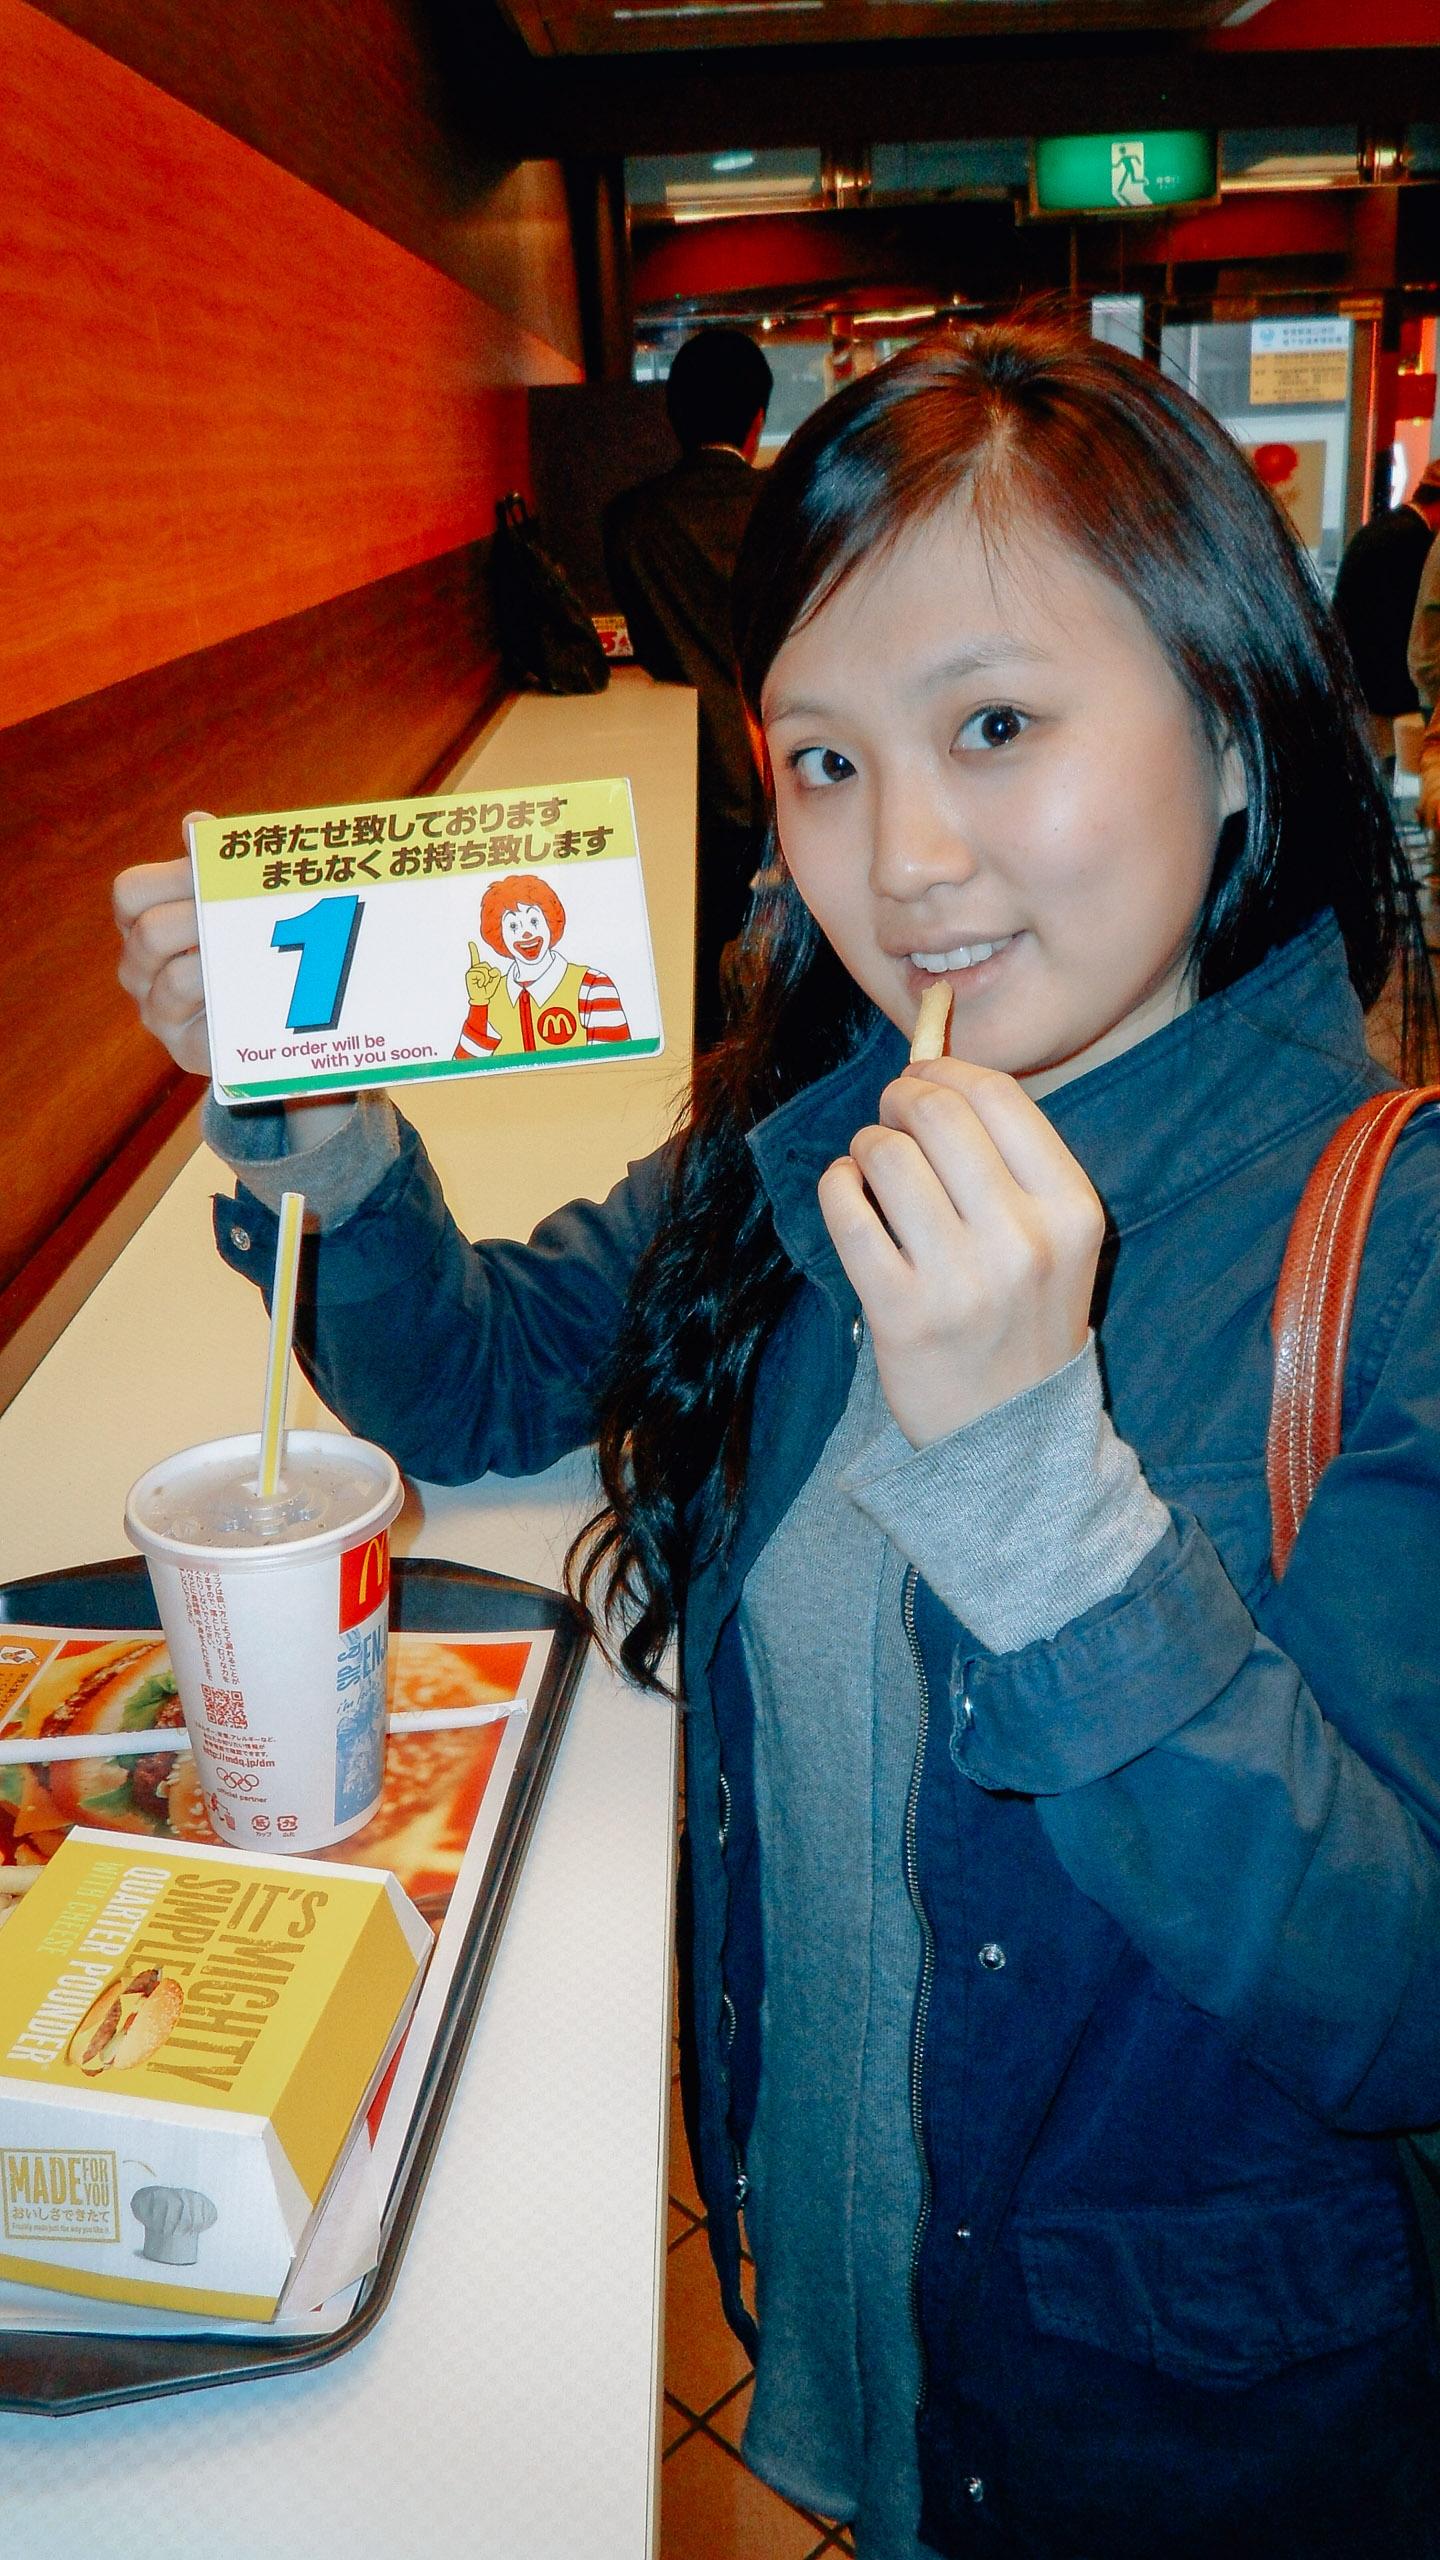 Japan - Tokyo Kyoto & Nikko - 2010-0426-SAM_0295